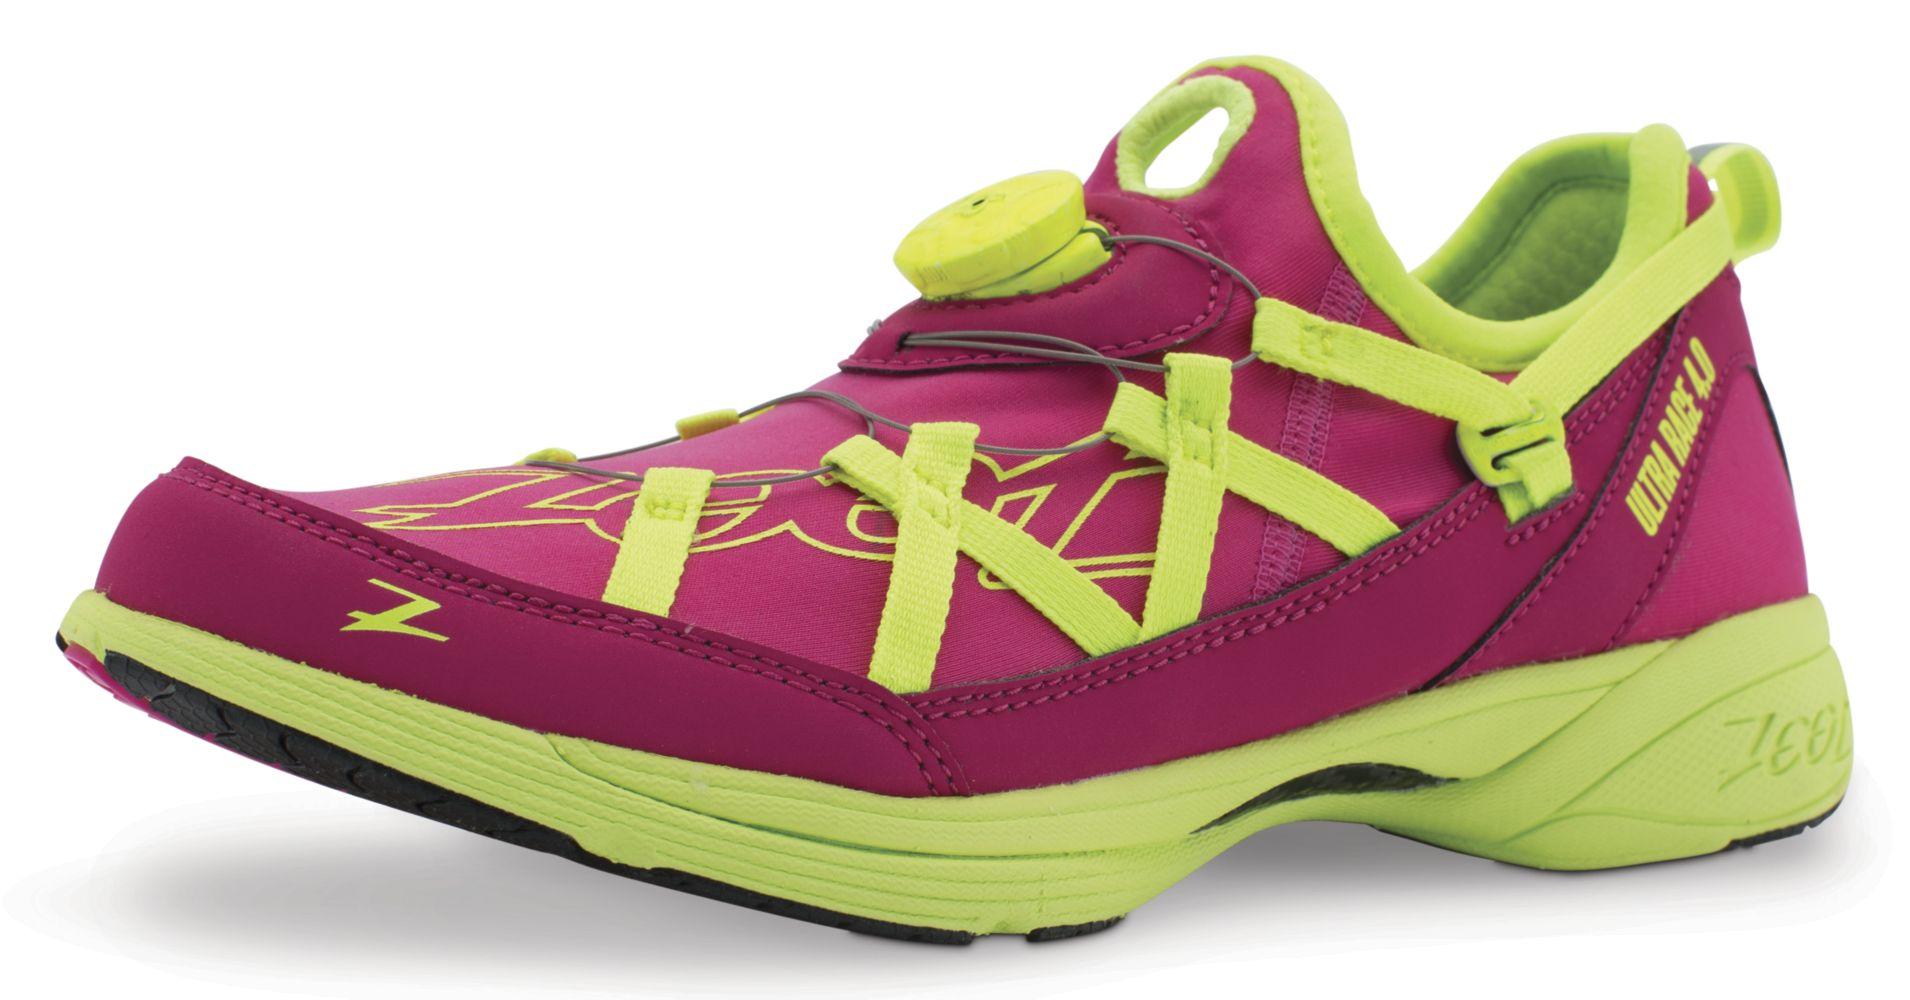 Zoot Women'S Running Shoes Reviews 78